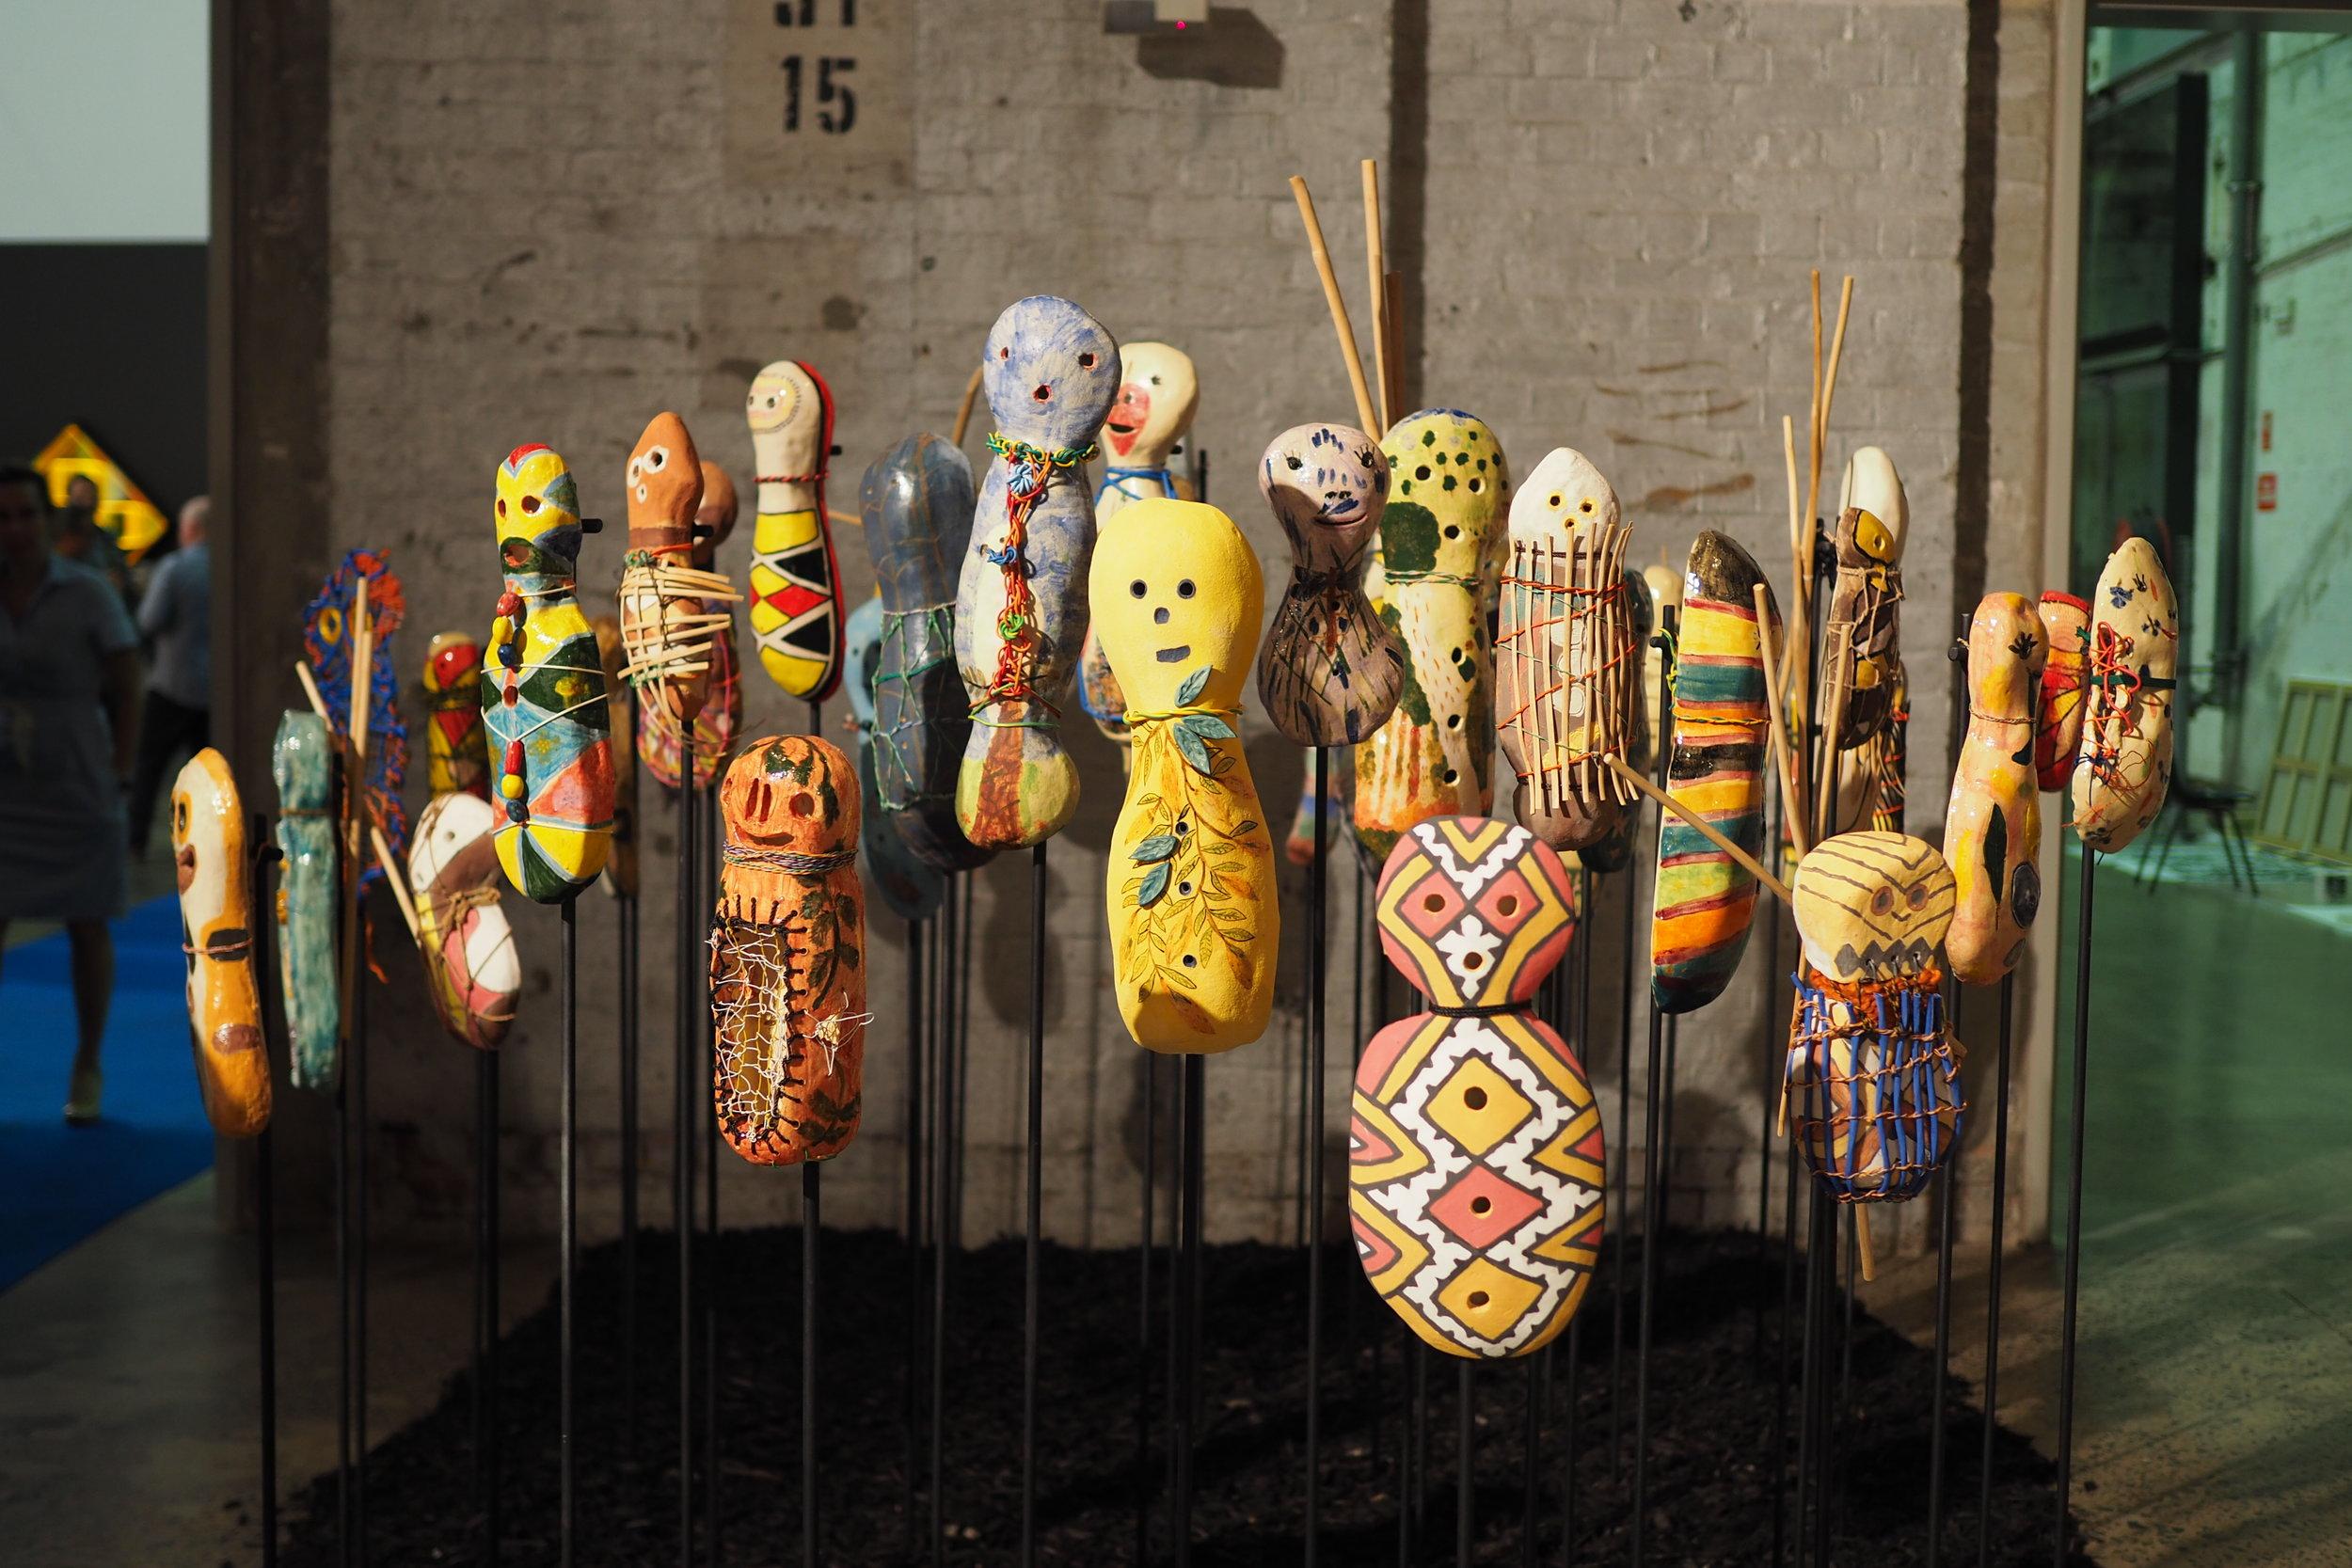 Girringun Aboriginal Art Centre 'Bagu of Girringun', Sydney Contemporary 2018, CREDIT Art Pharmacy Consulting